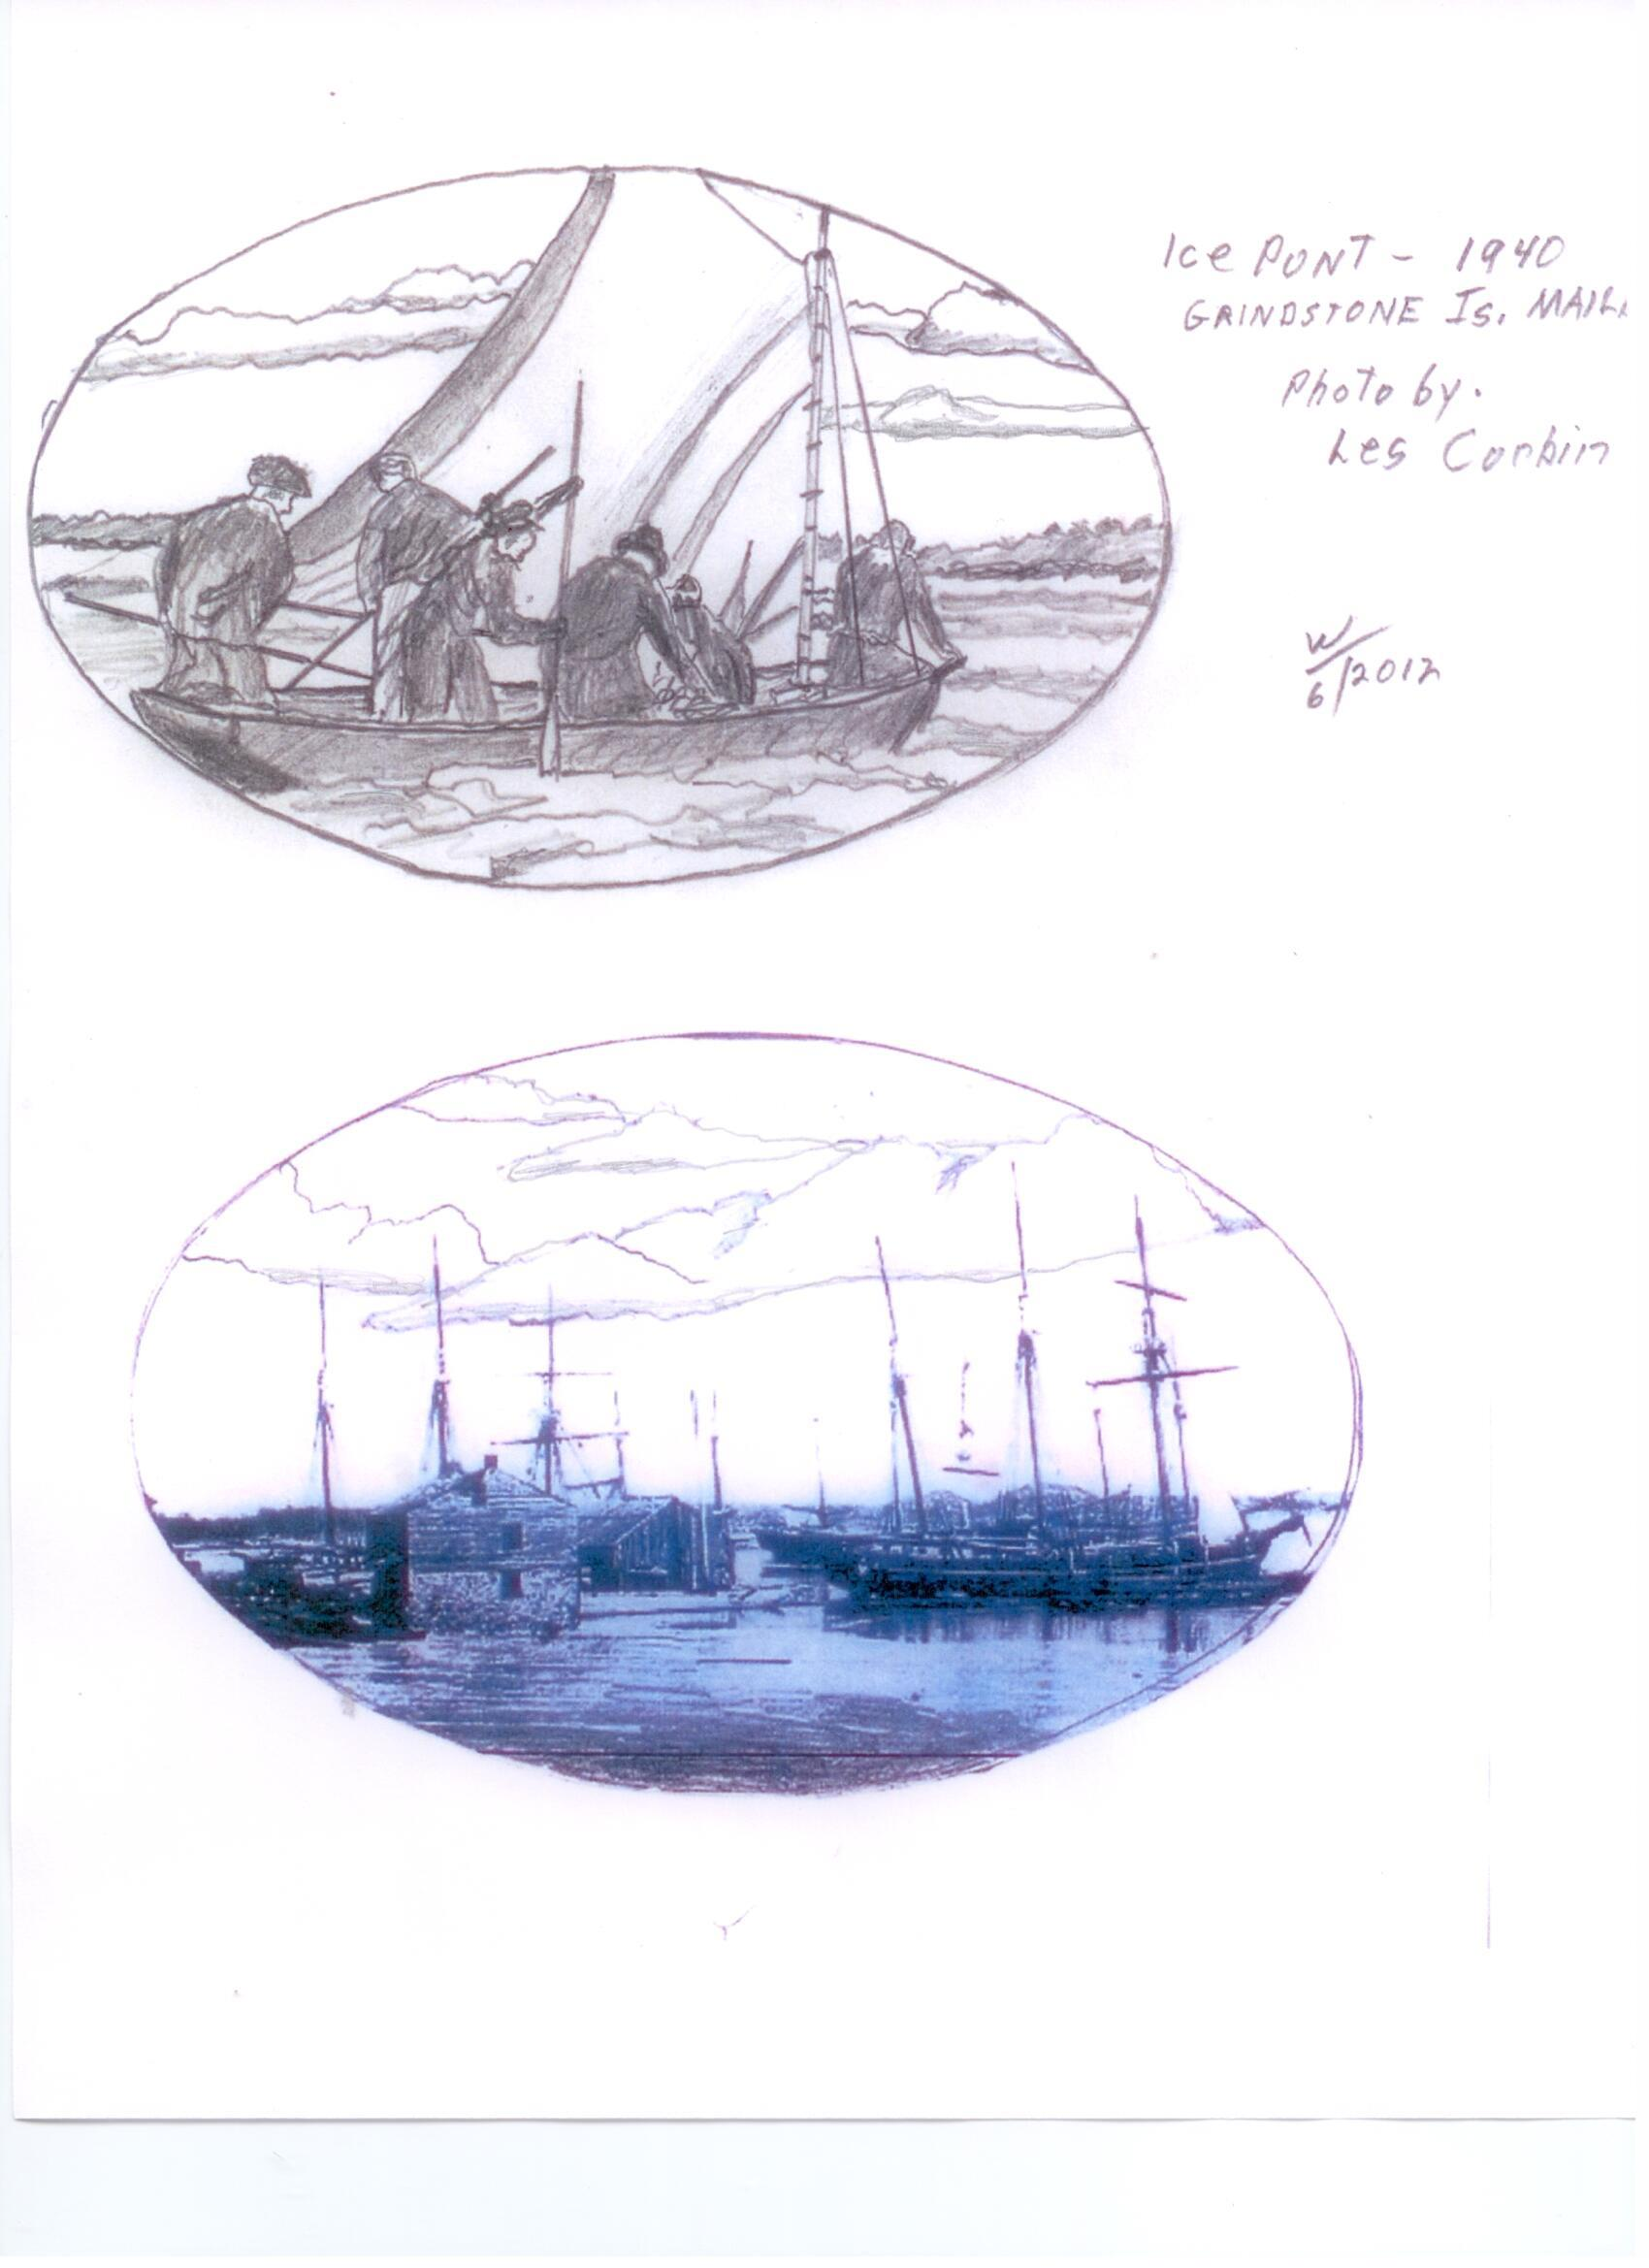 Corbin Sketches